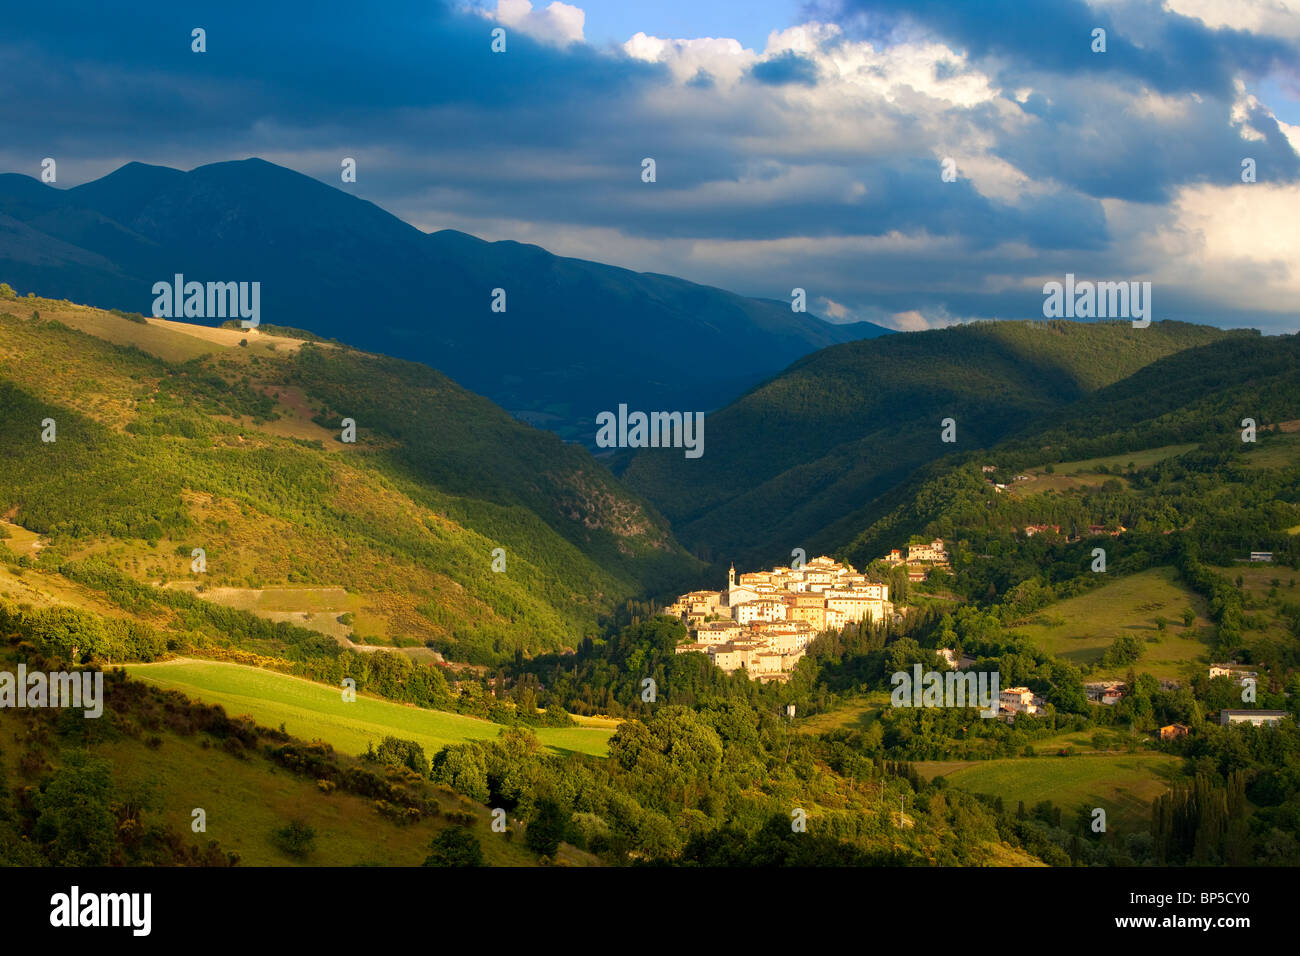 Medieval town of Preci in the Valnerina, Monti Sibillini National Park, Umbria Italy - Stock Image